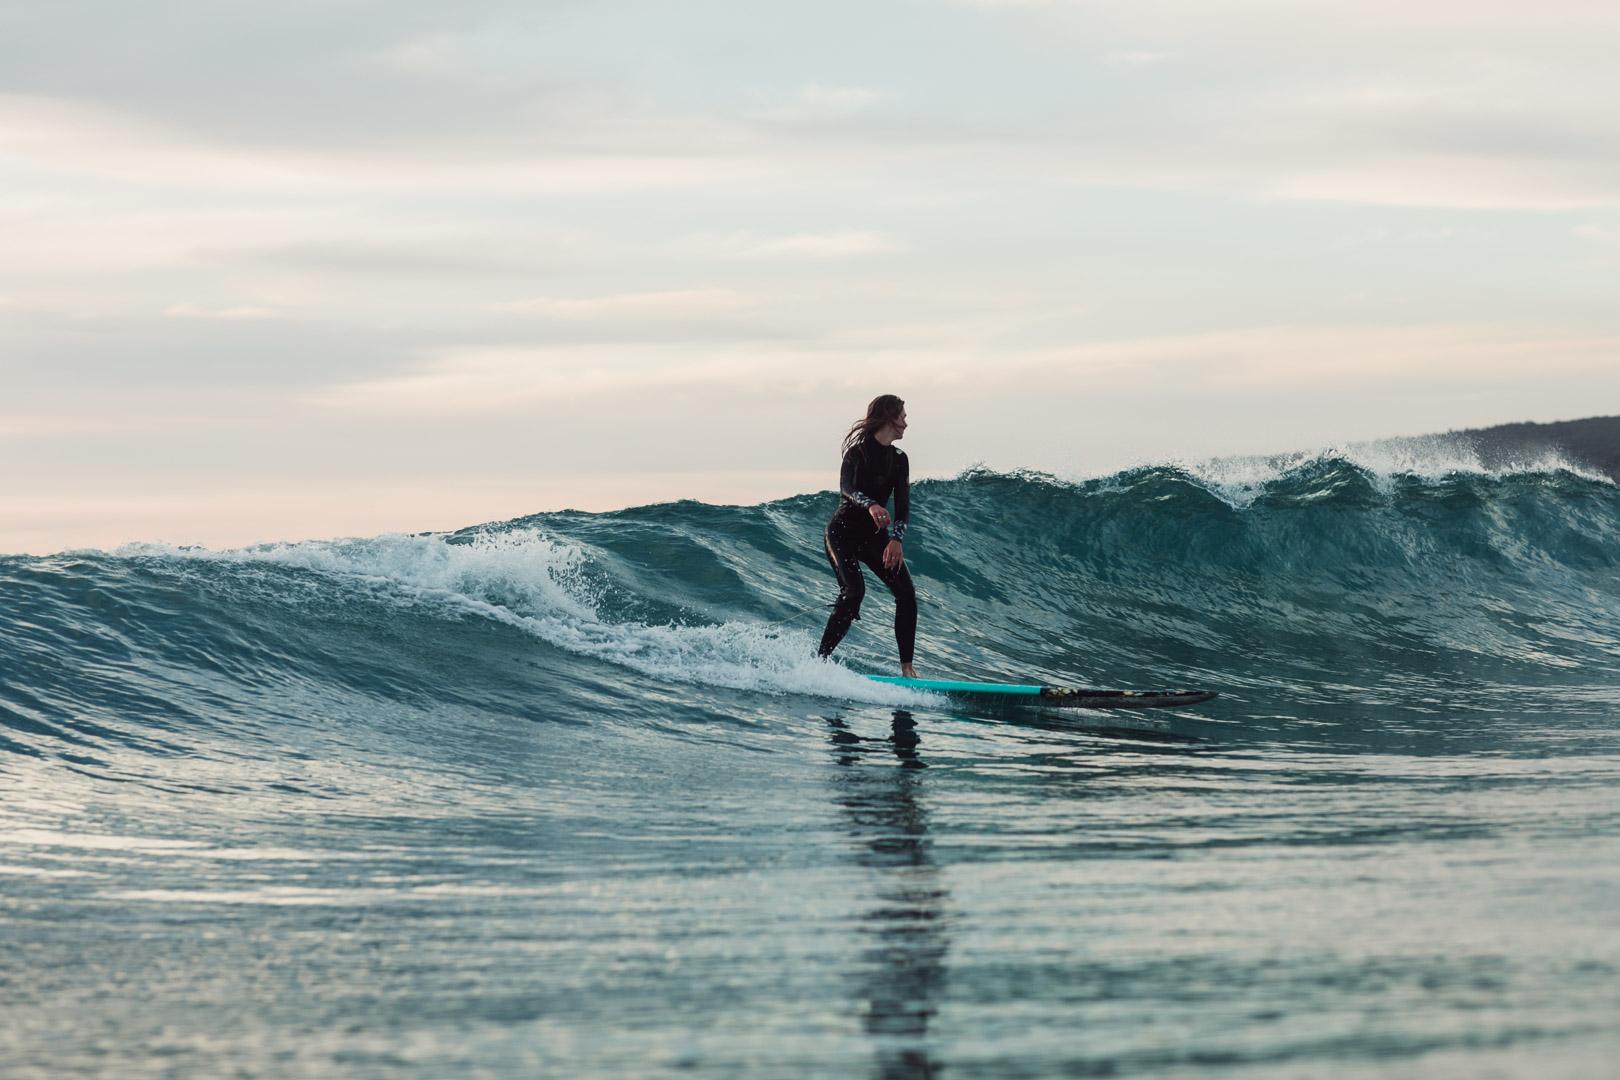 Surfgirl-mxmsurfphoto-Morgan20180508-898.jpg